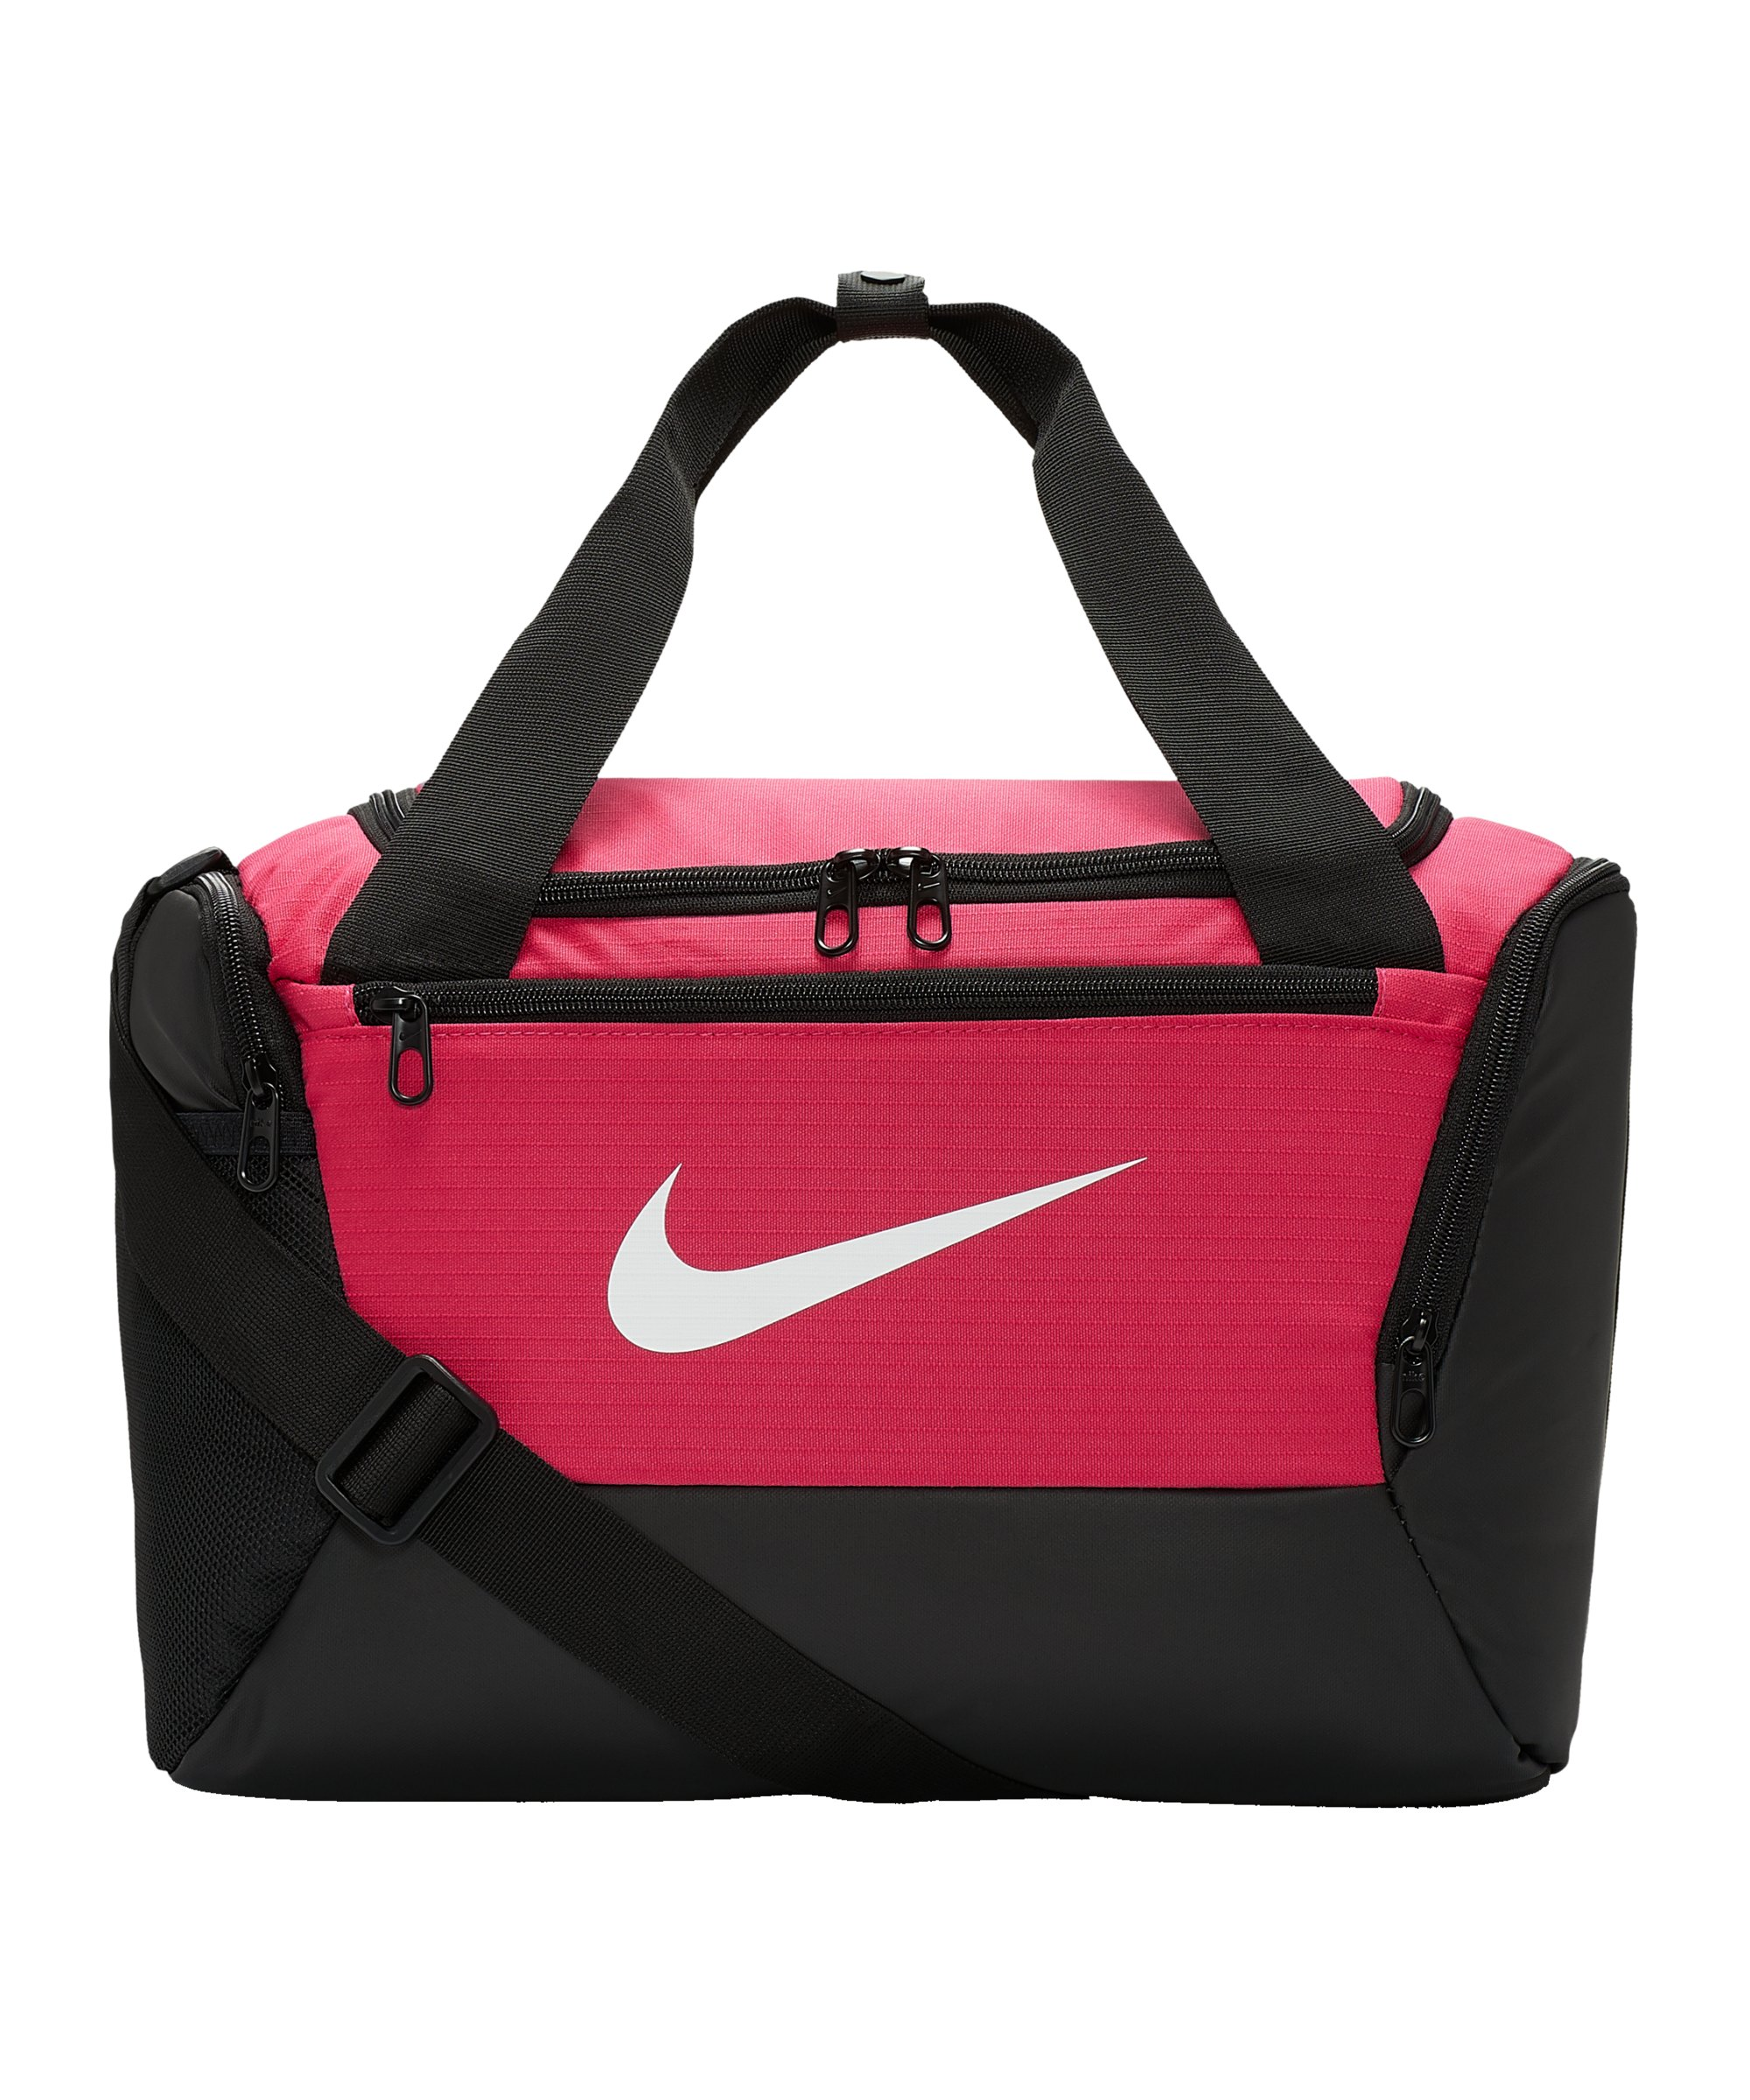 Nike Brasilia 9.0 Dufflebag Extrasmall F666 - pink